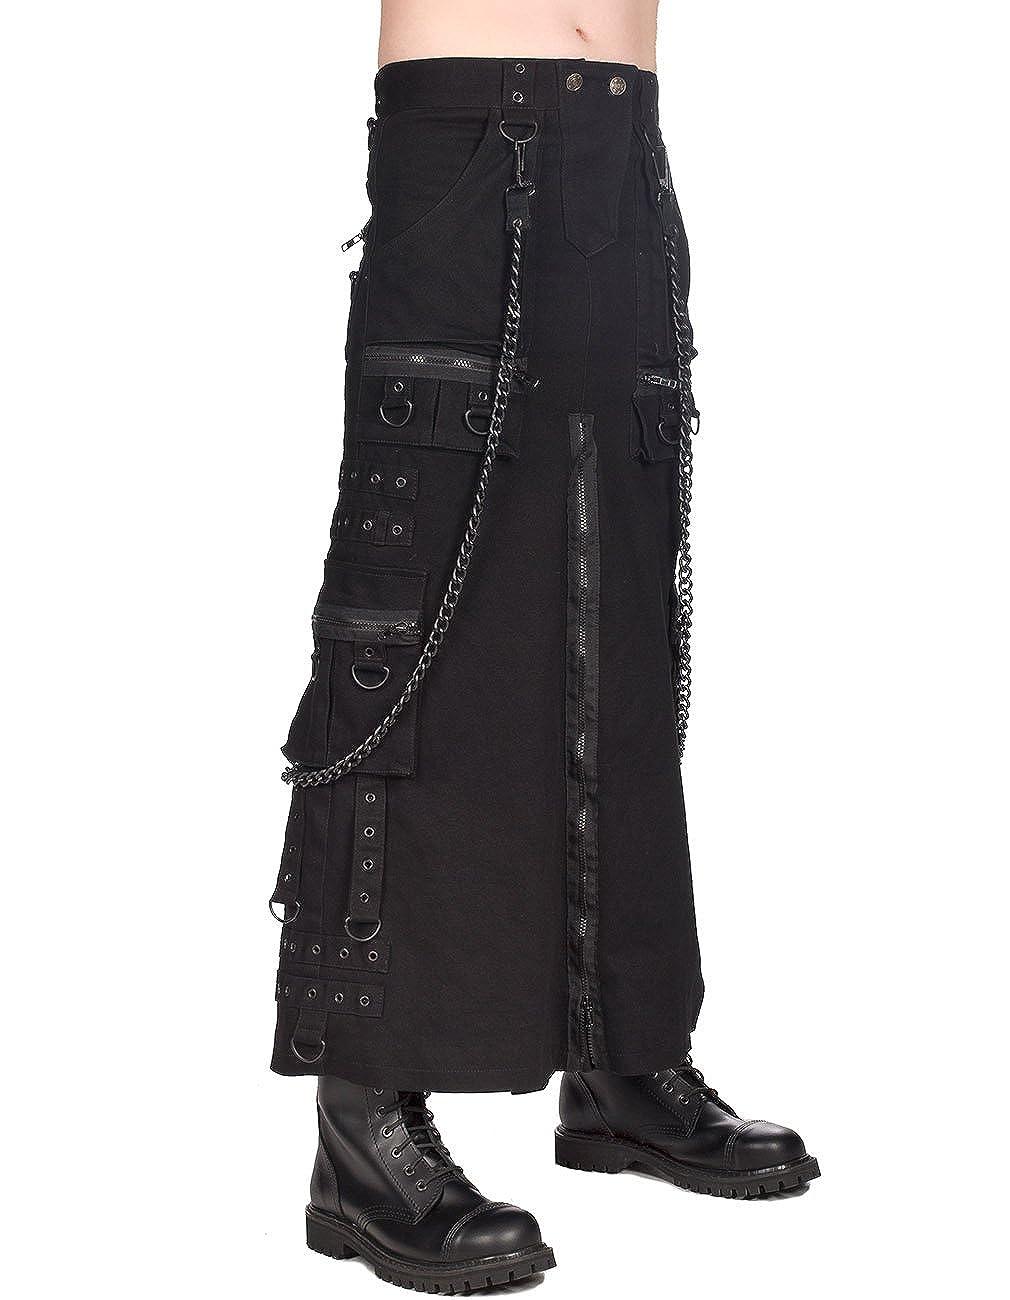 Black Pistol Herren Gothic Kilt / Rock mit Ketten - Chain Skirt Denim